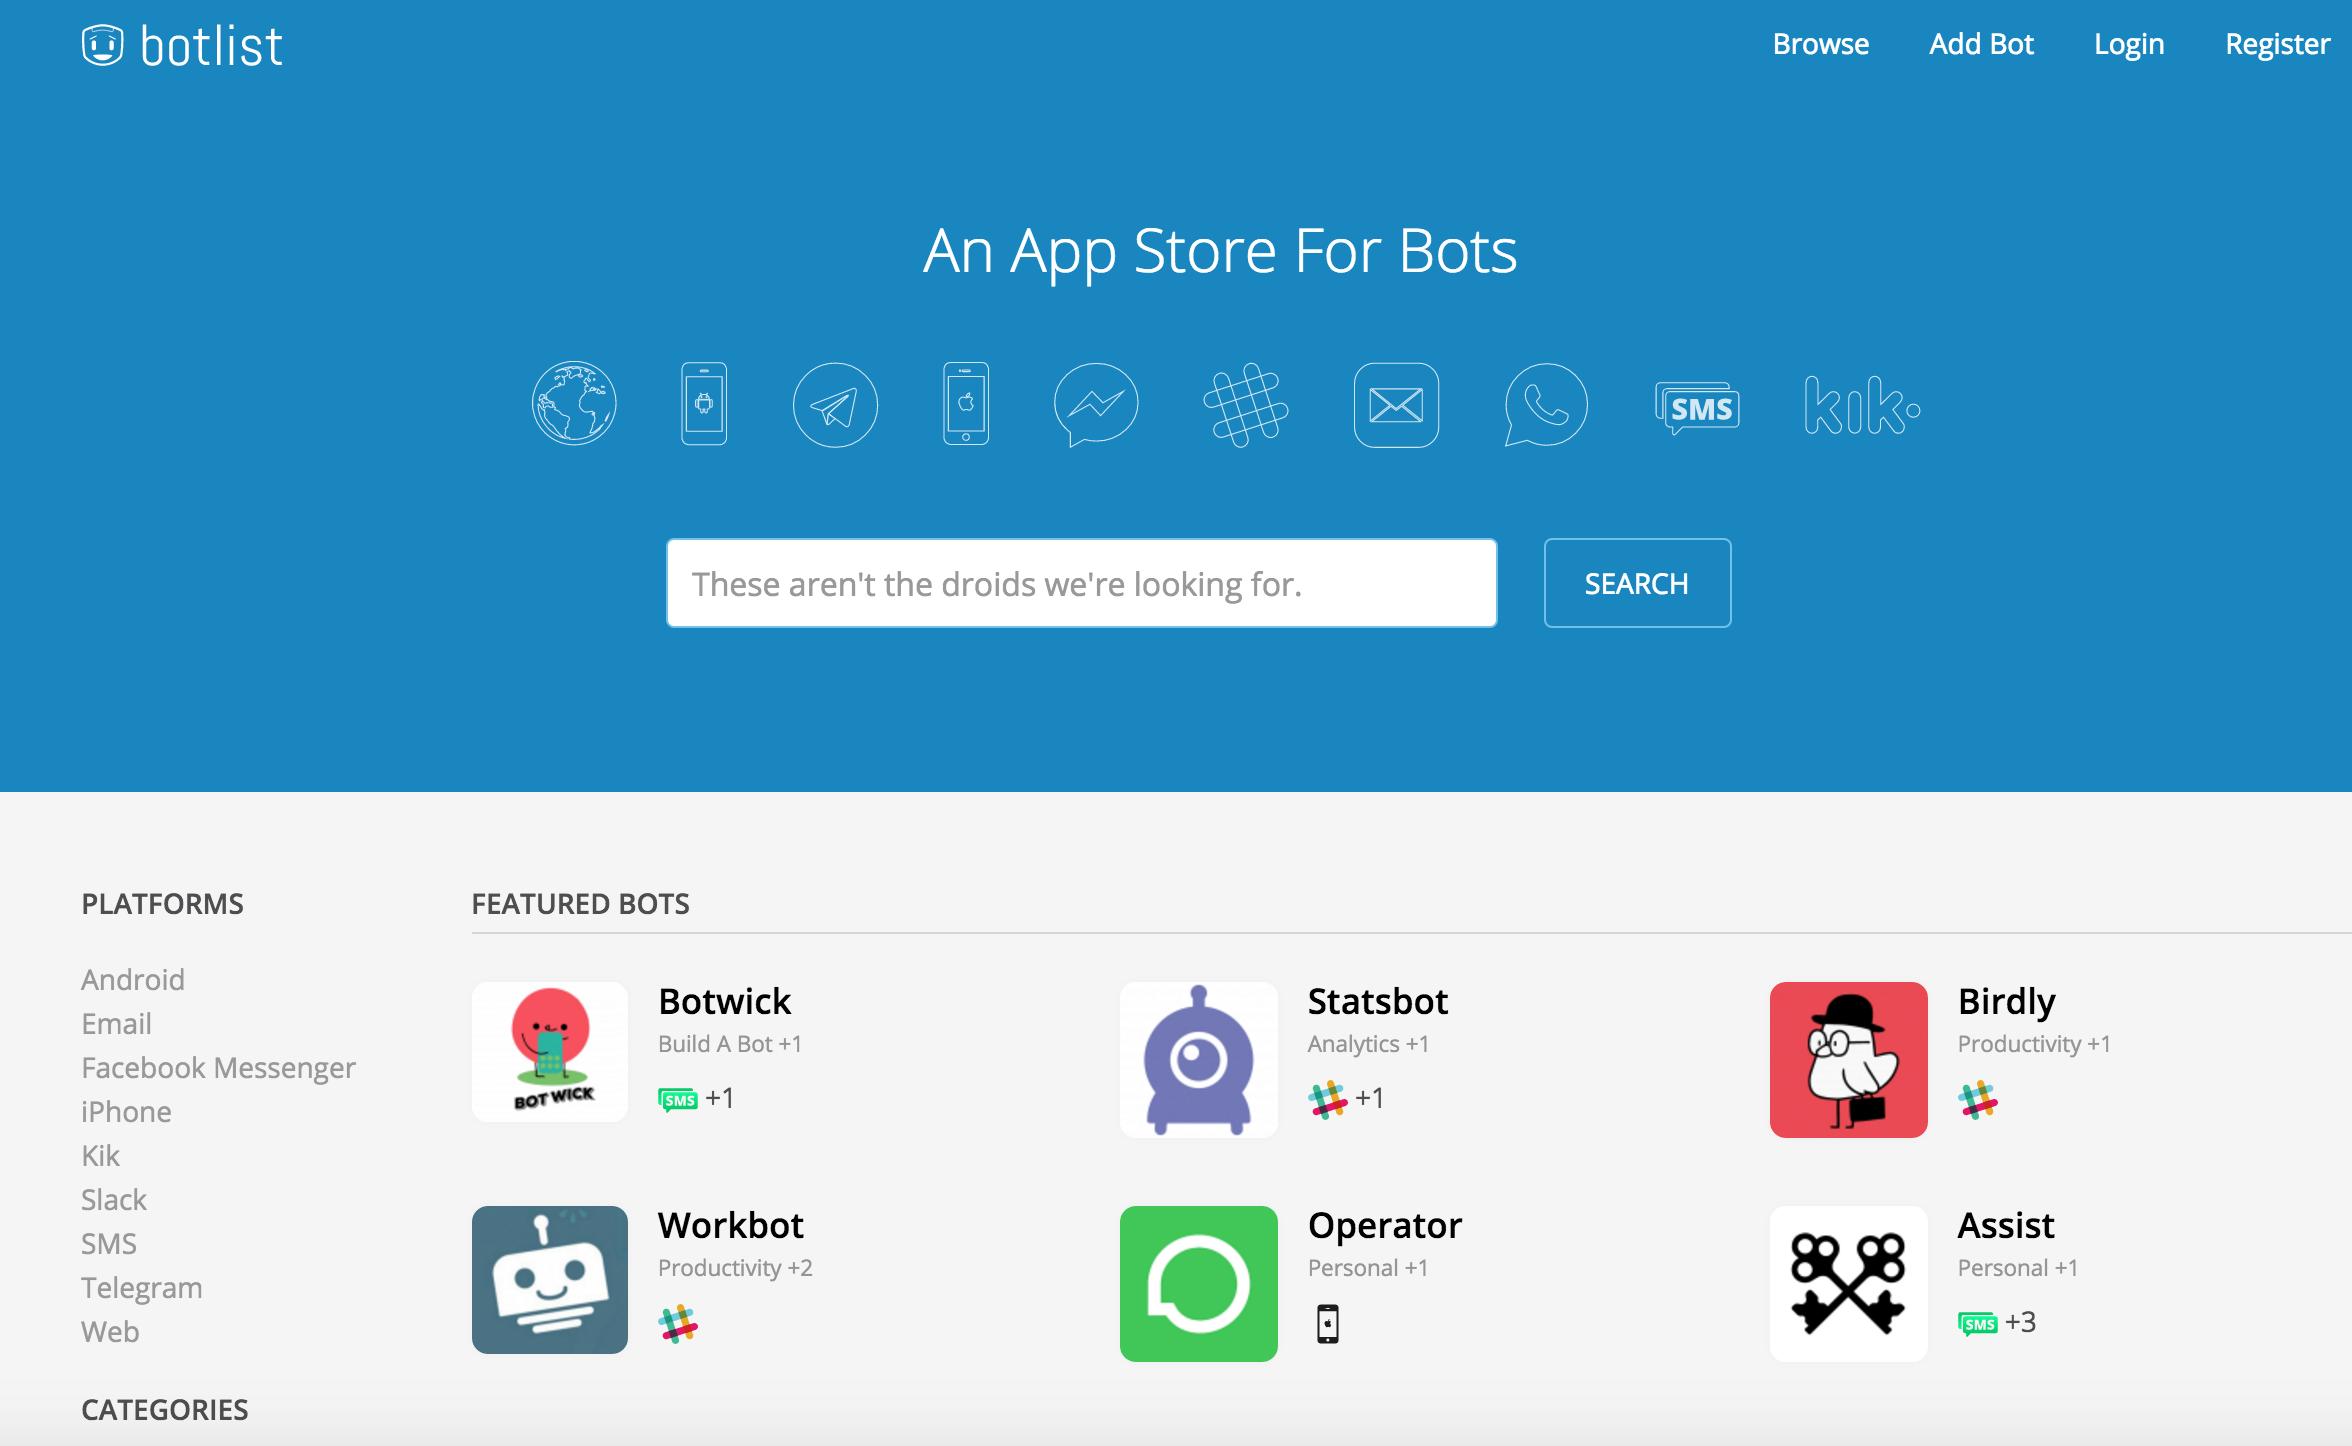 Botlist is an app store for bots | TechCrunch